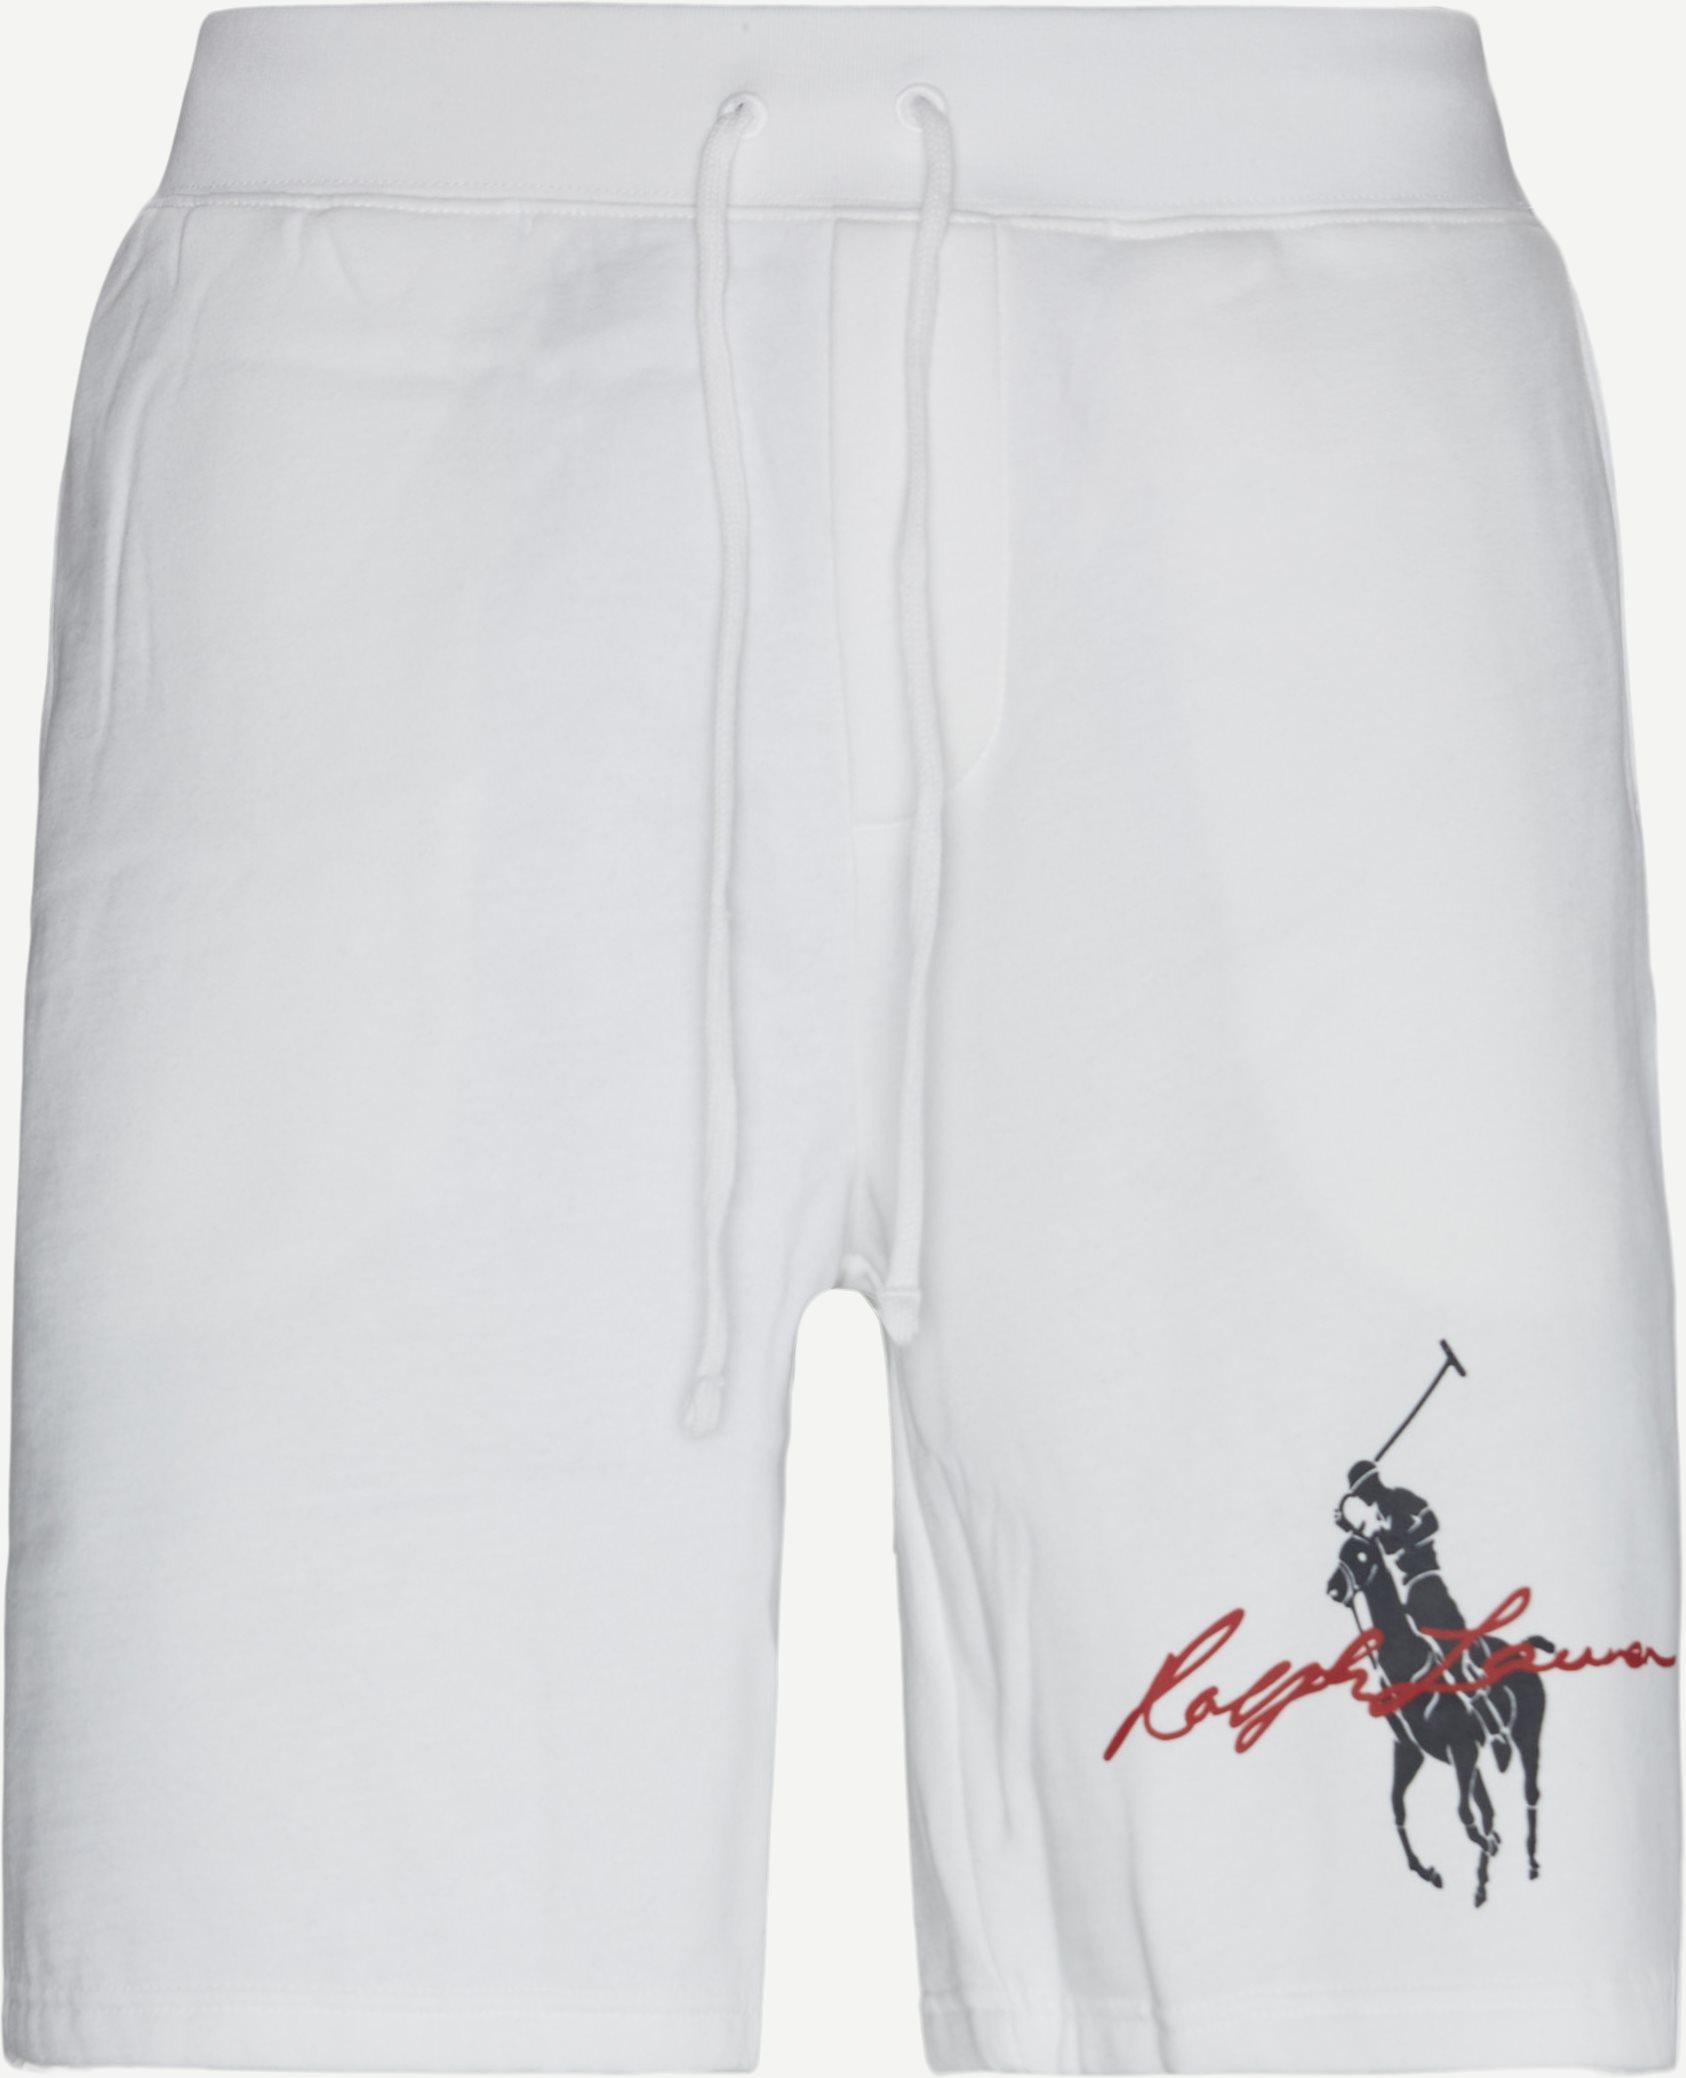 Sweatshorts - Shorts - Regular fit - Hvid